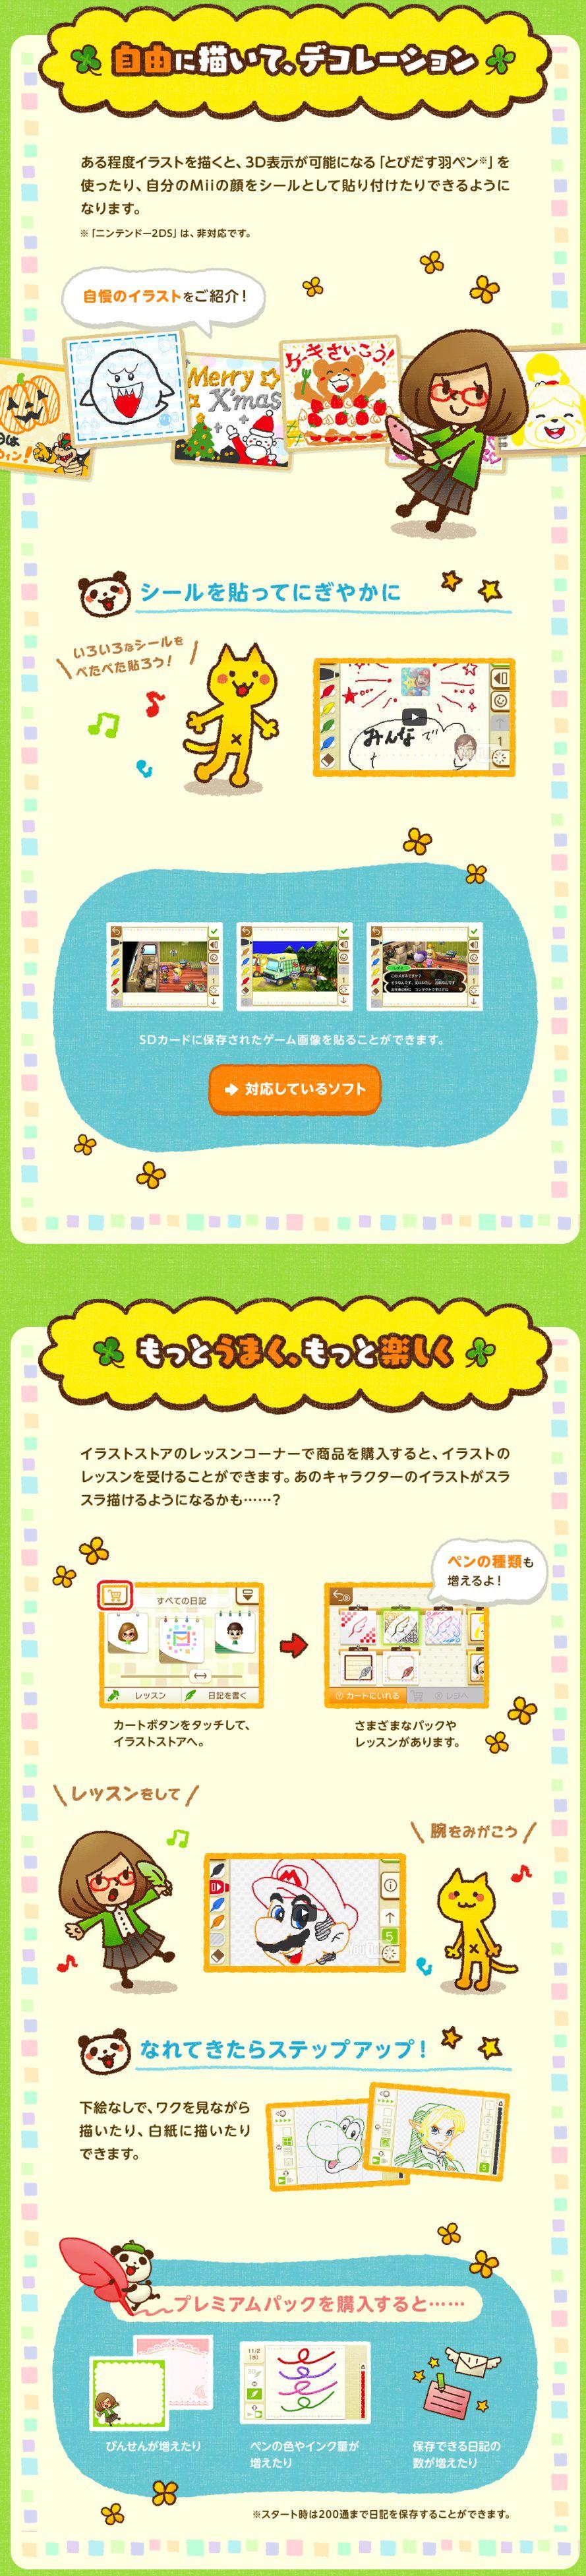 image_7157.jpg